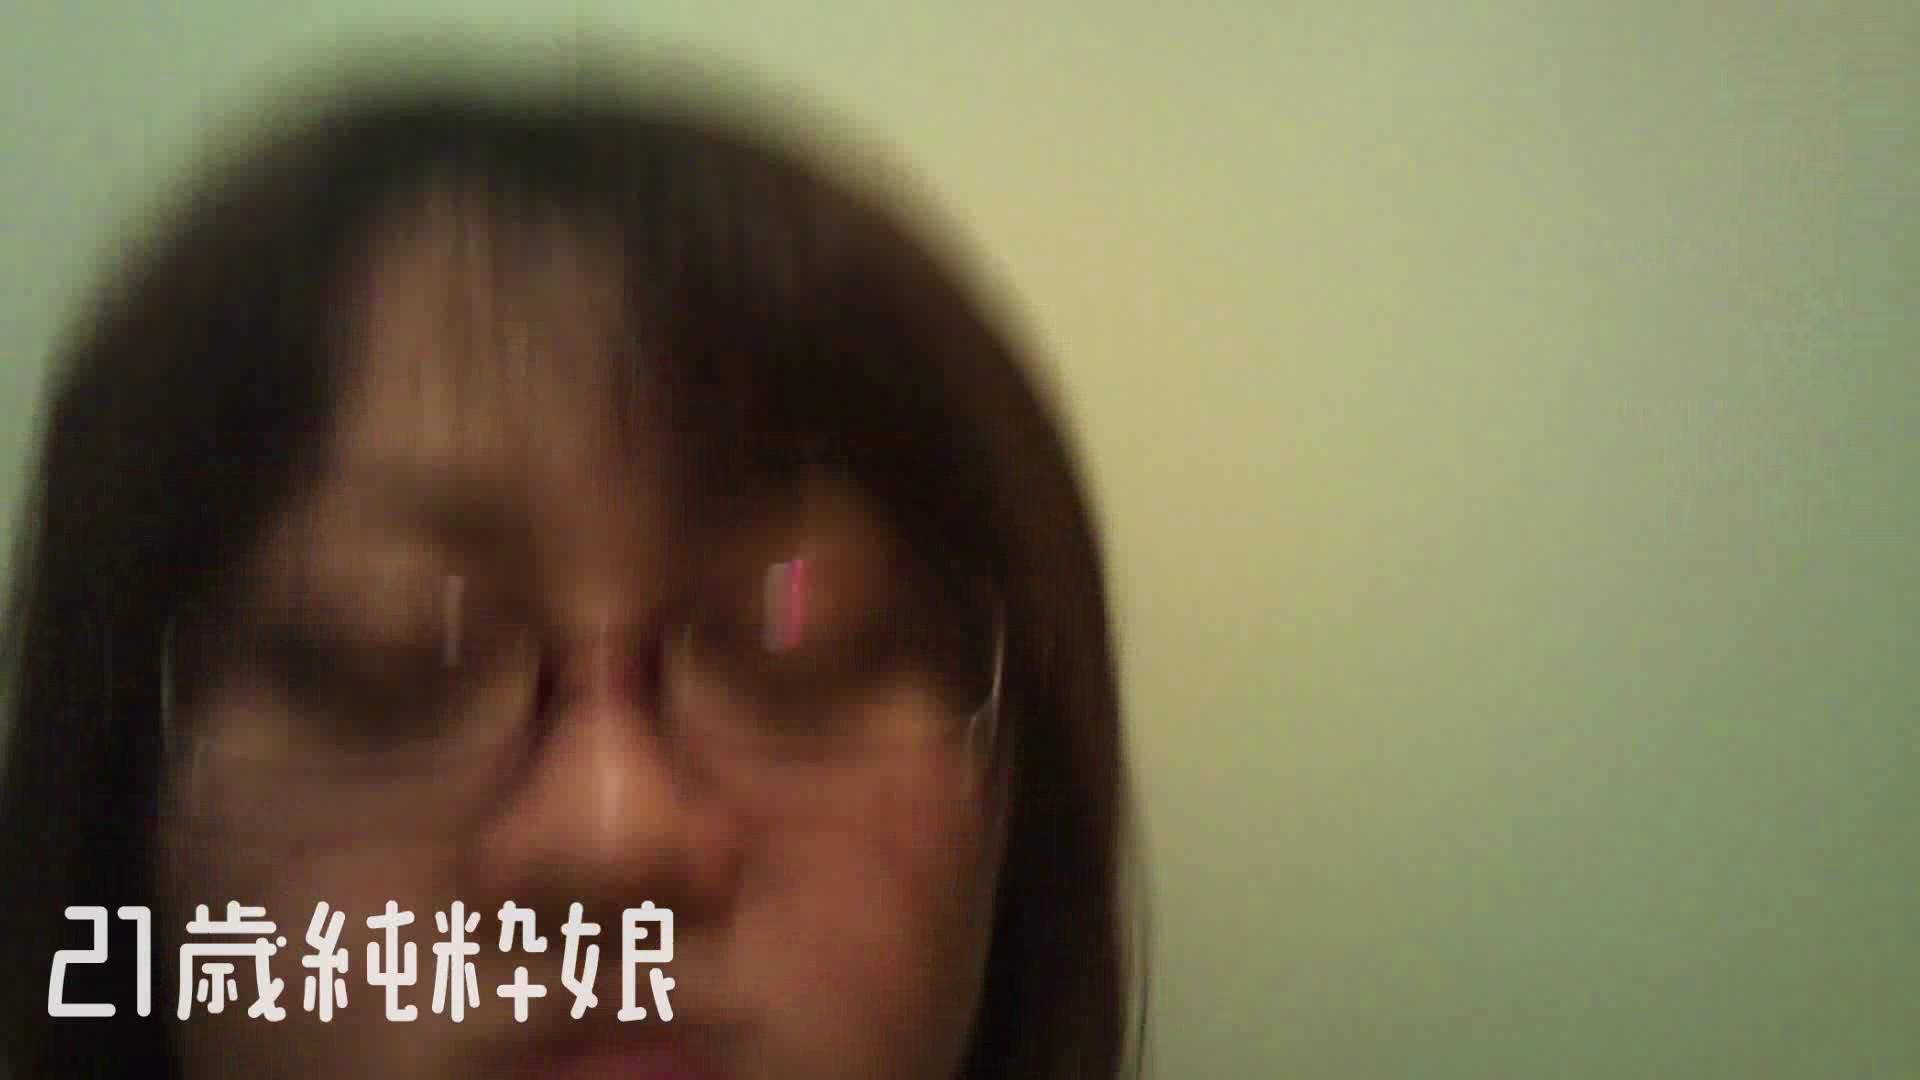 Gカップ21歳純粋嬢第2弾Vol.5 学校 オメコ動画キャプチャ 77pic 17